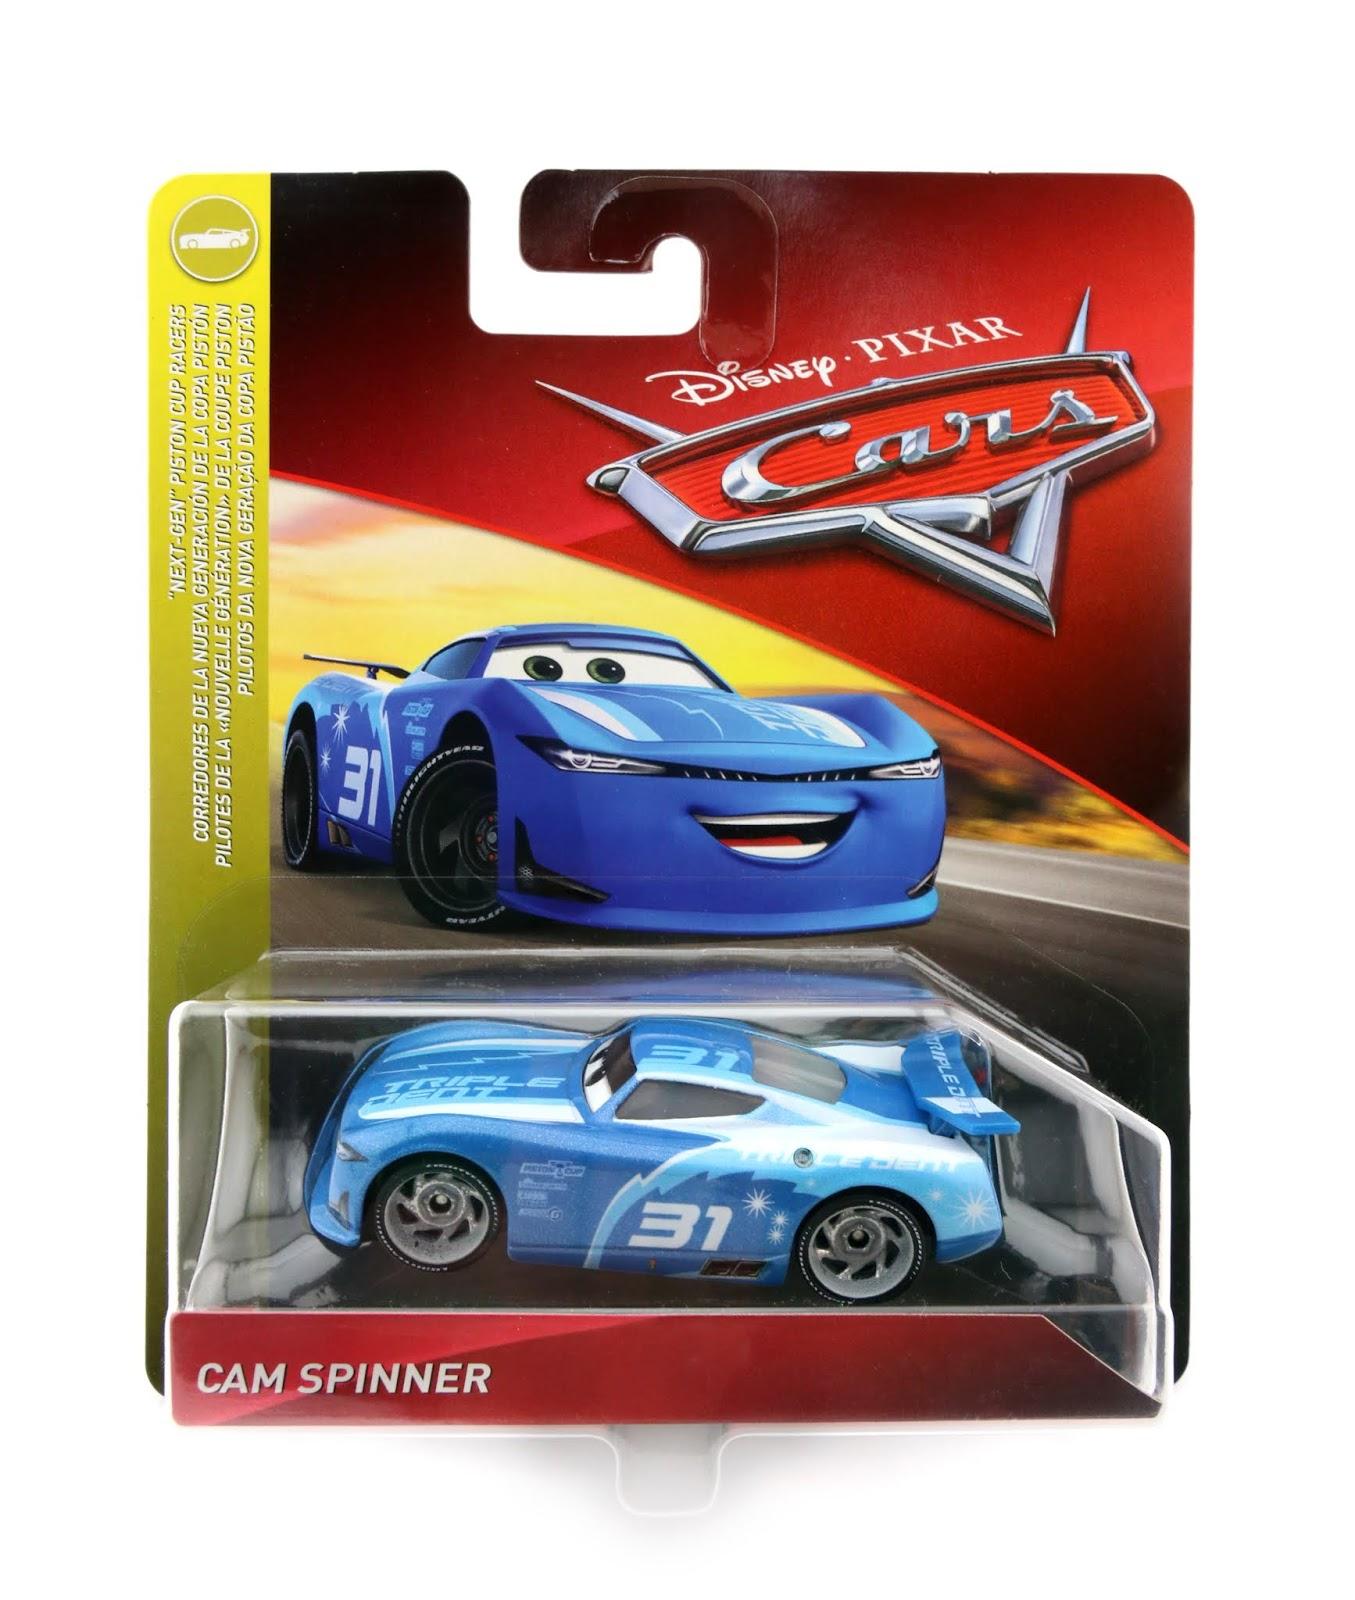 cars 3 cam spinner review cars 3 cam spinner review